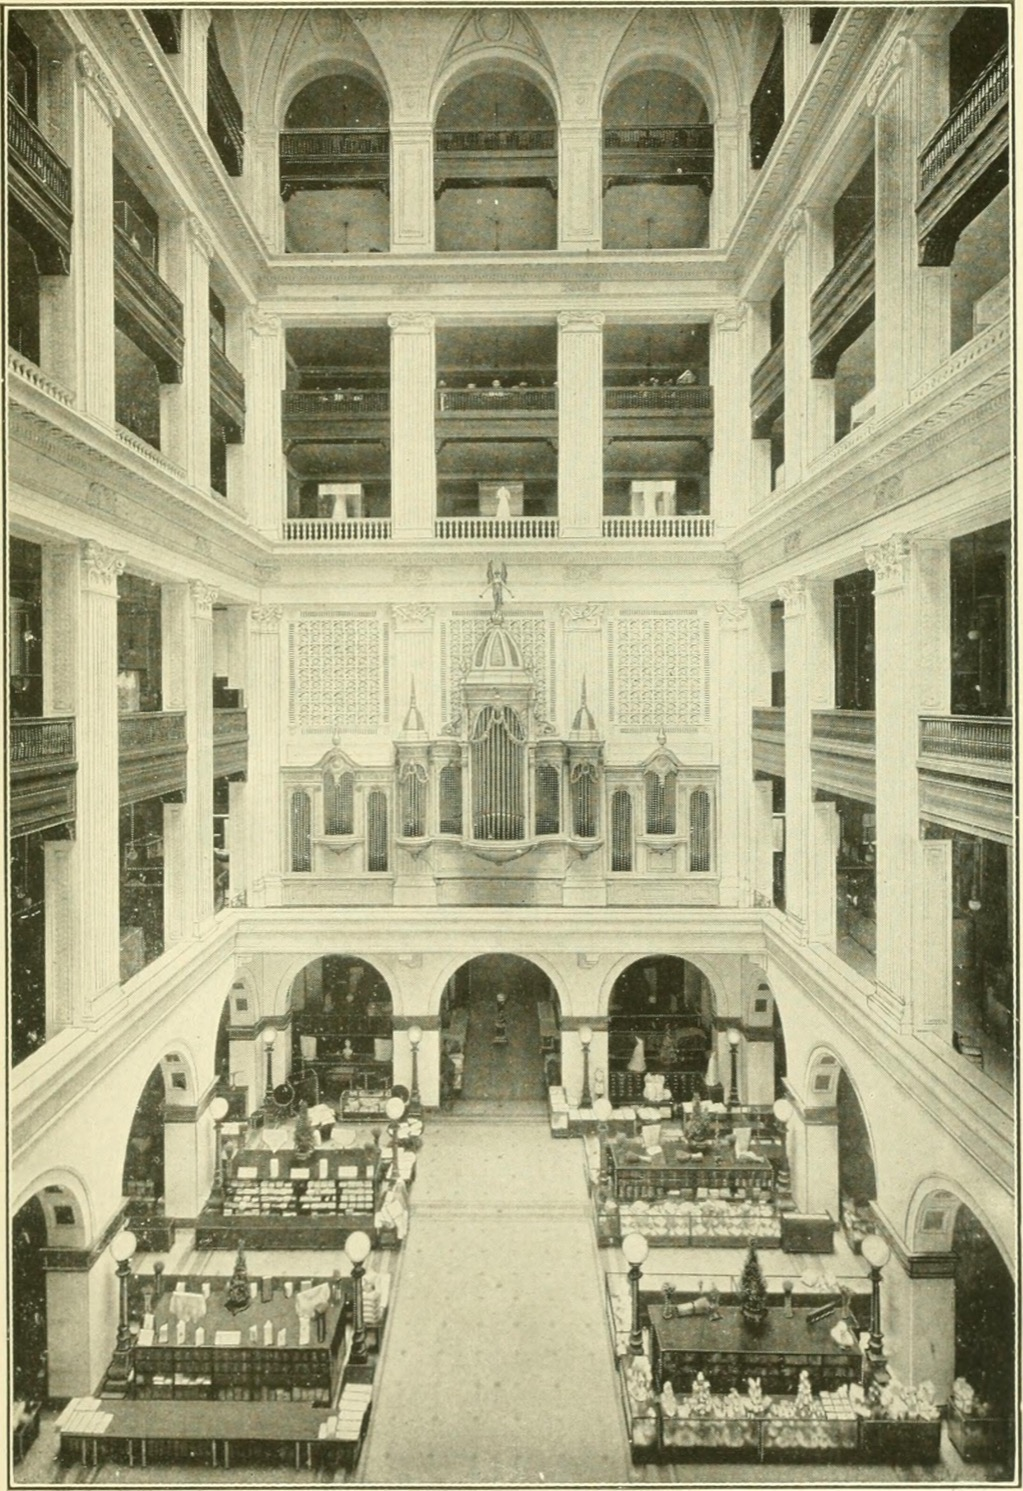 Wanamaker's Department Stores